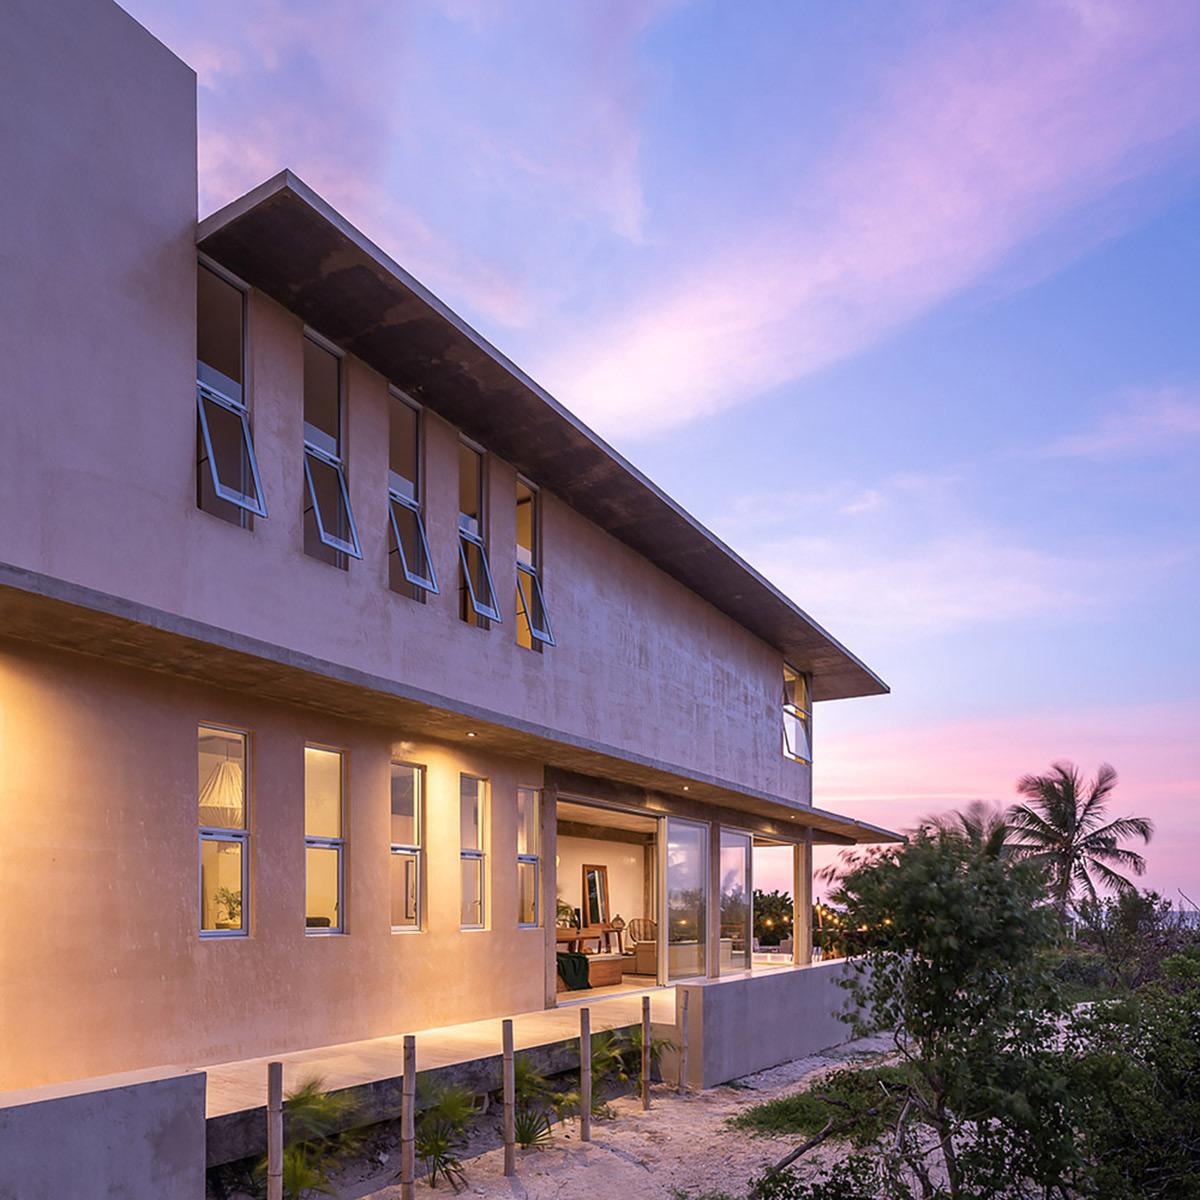 Casa-Gemela-Laboratorio-Arquitectura-Manolo-Solis-06